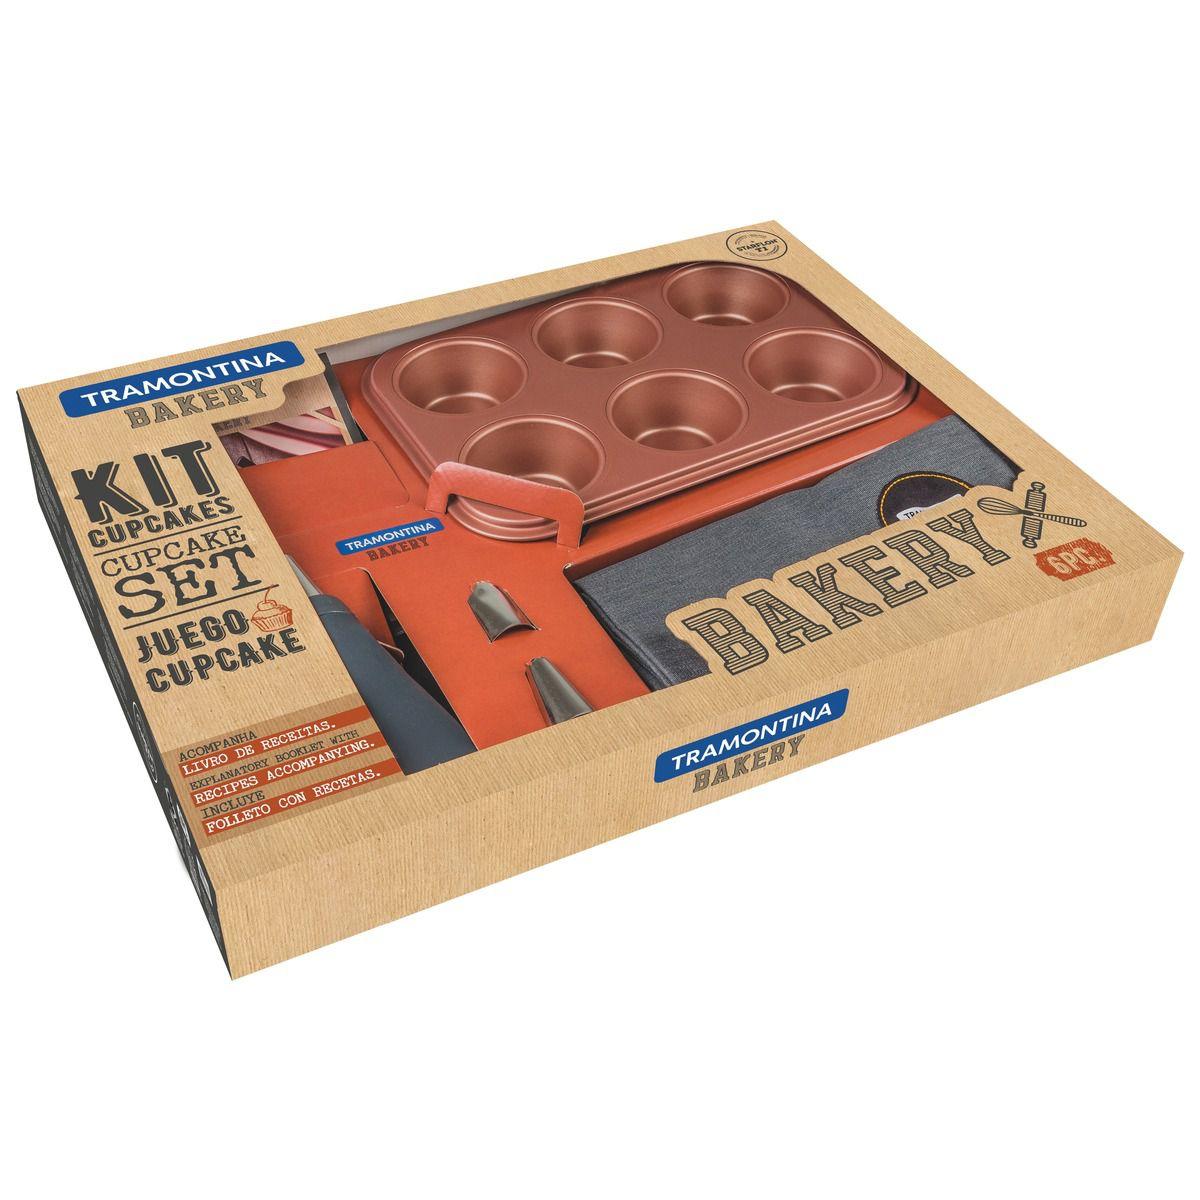 Kit para Cupcake Tramontina em Alumínio com Revestimento Interno Antiaderente Starflon T1 6 Peças 29899/065 | Lojas Estrela